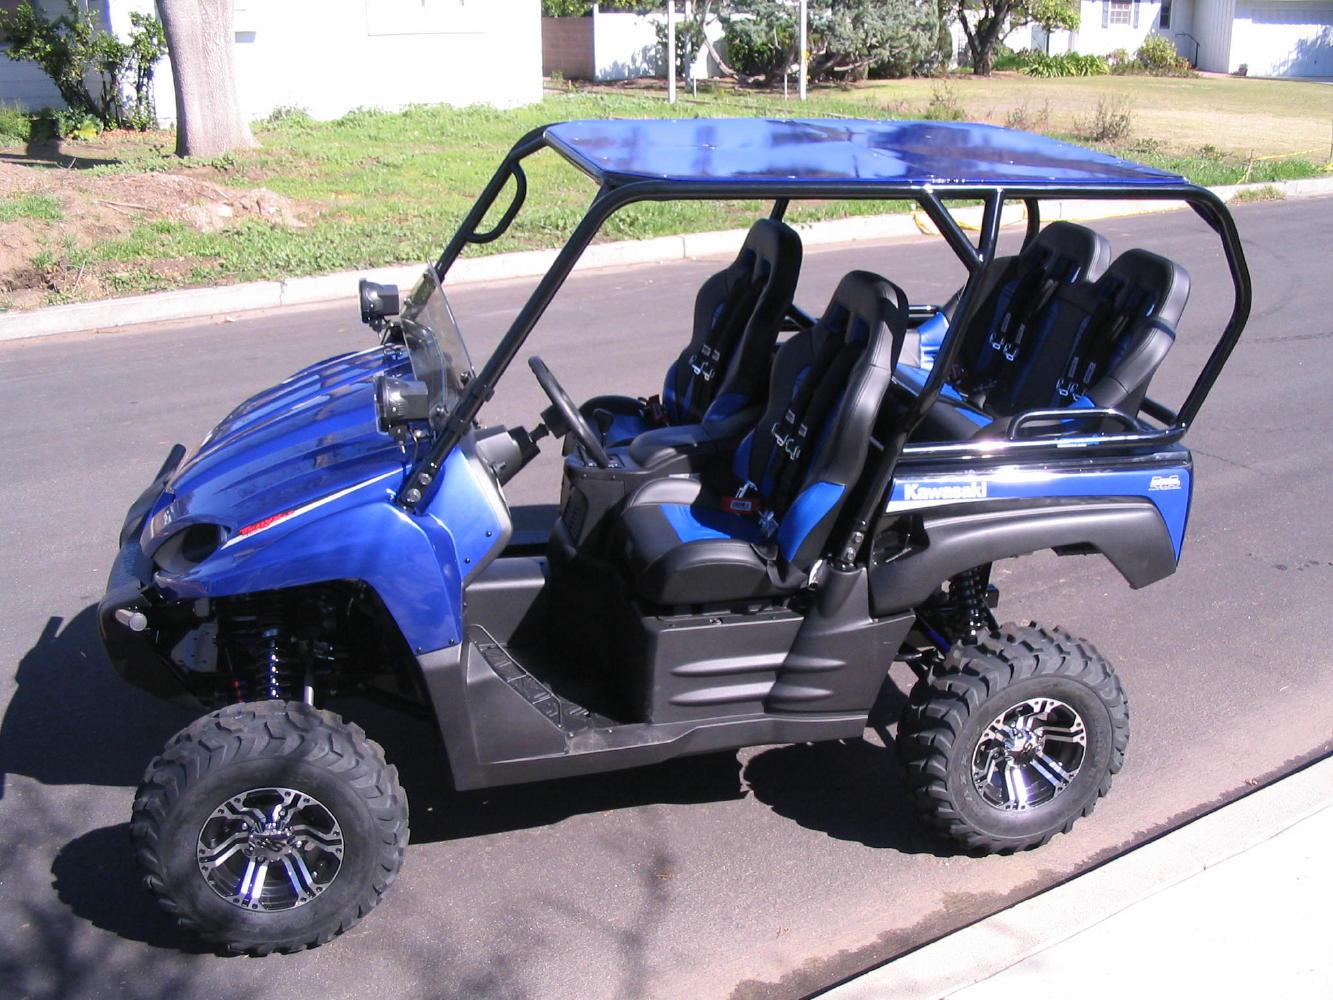 2009 teryx 4 seater for sale - kawasaki teryx forum